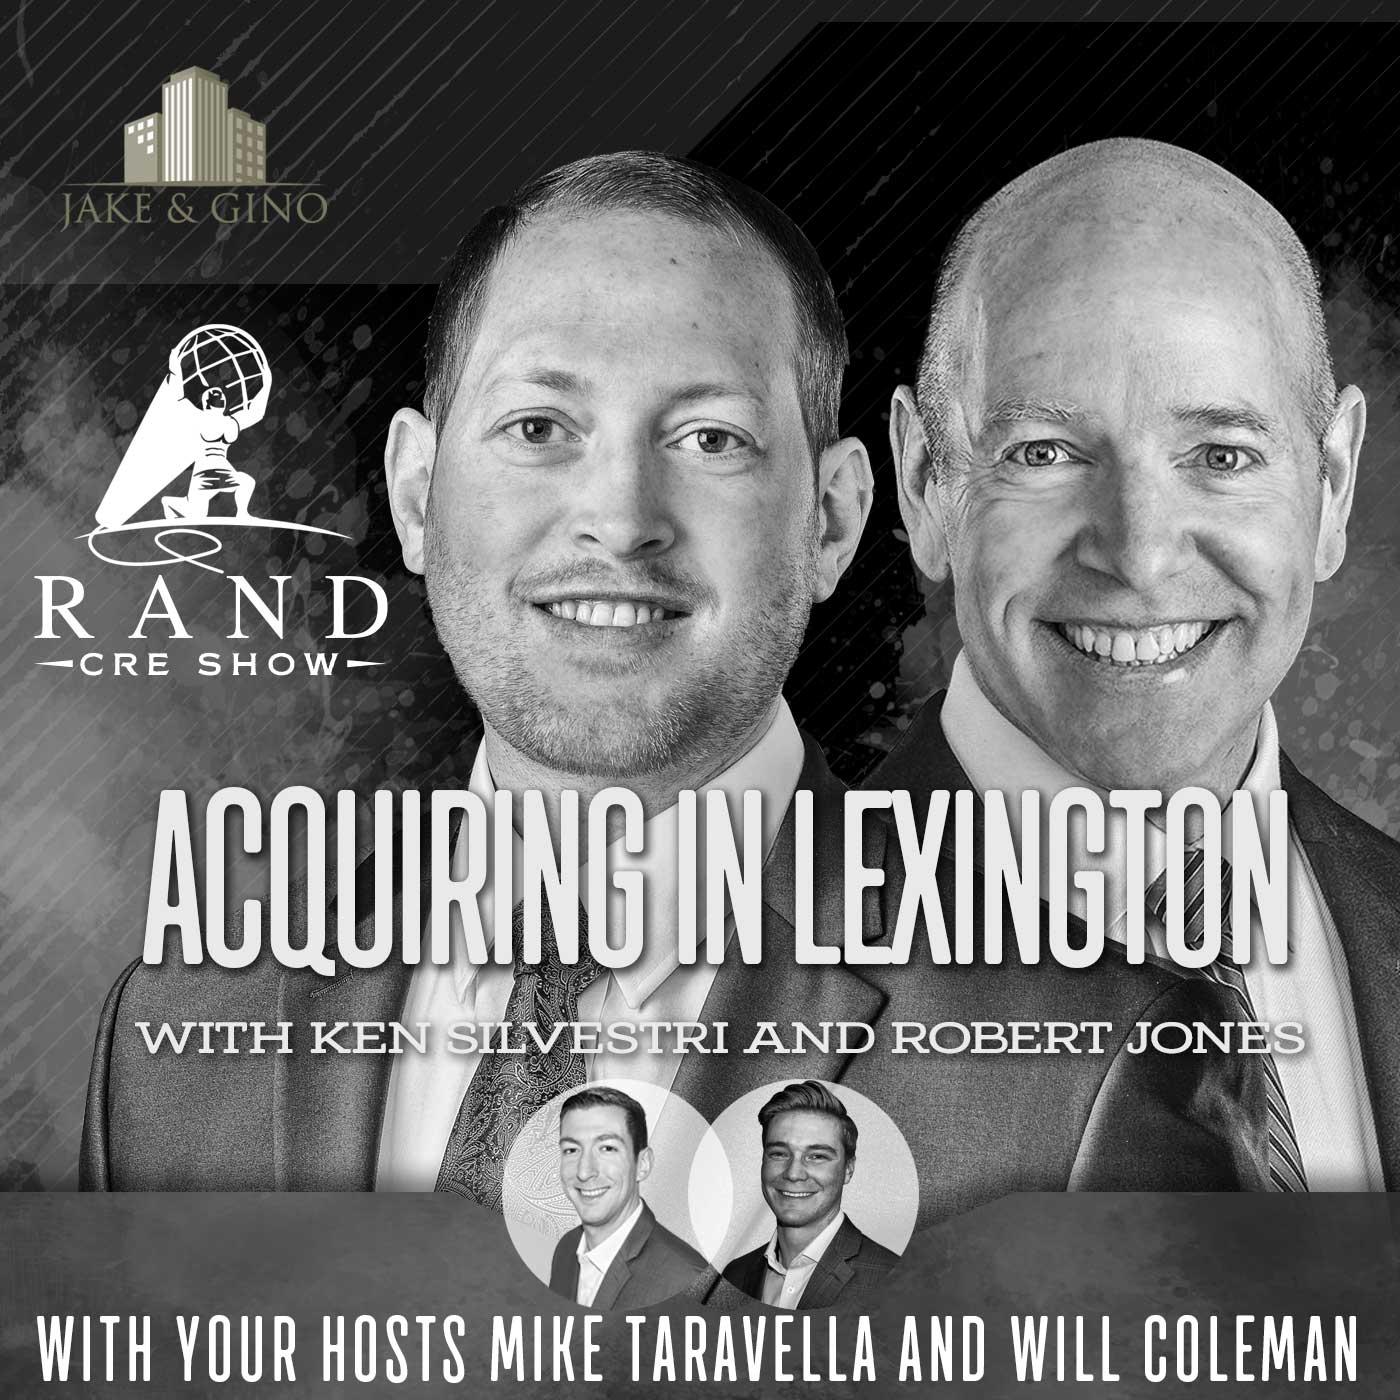 RCRE - Acquiring In Lexington with Ken Silvestri and Robert Jones